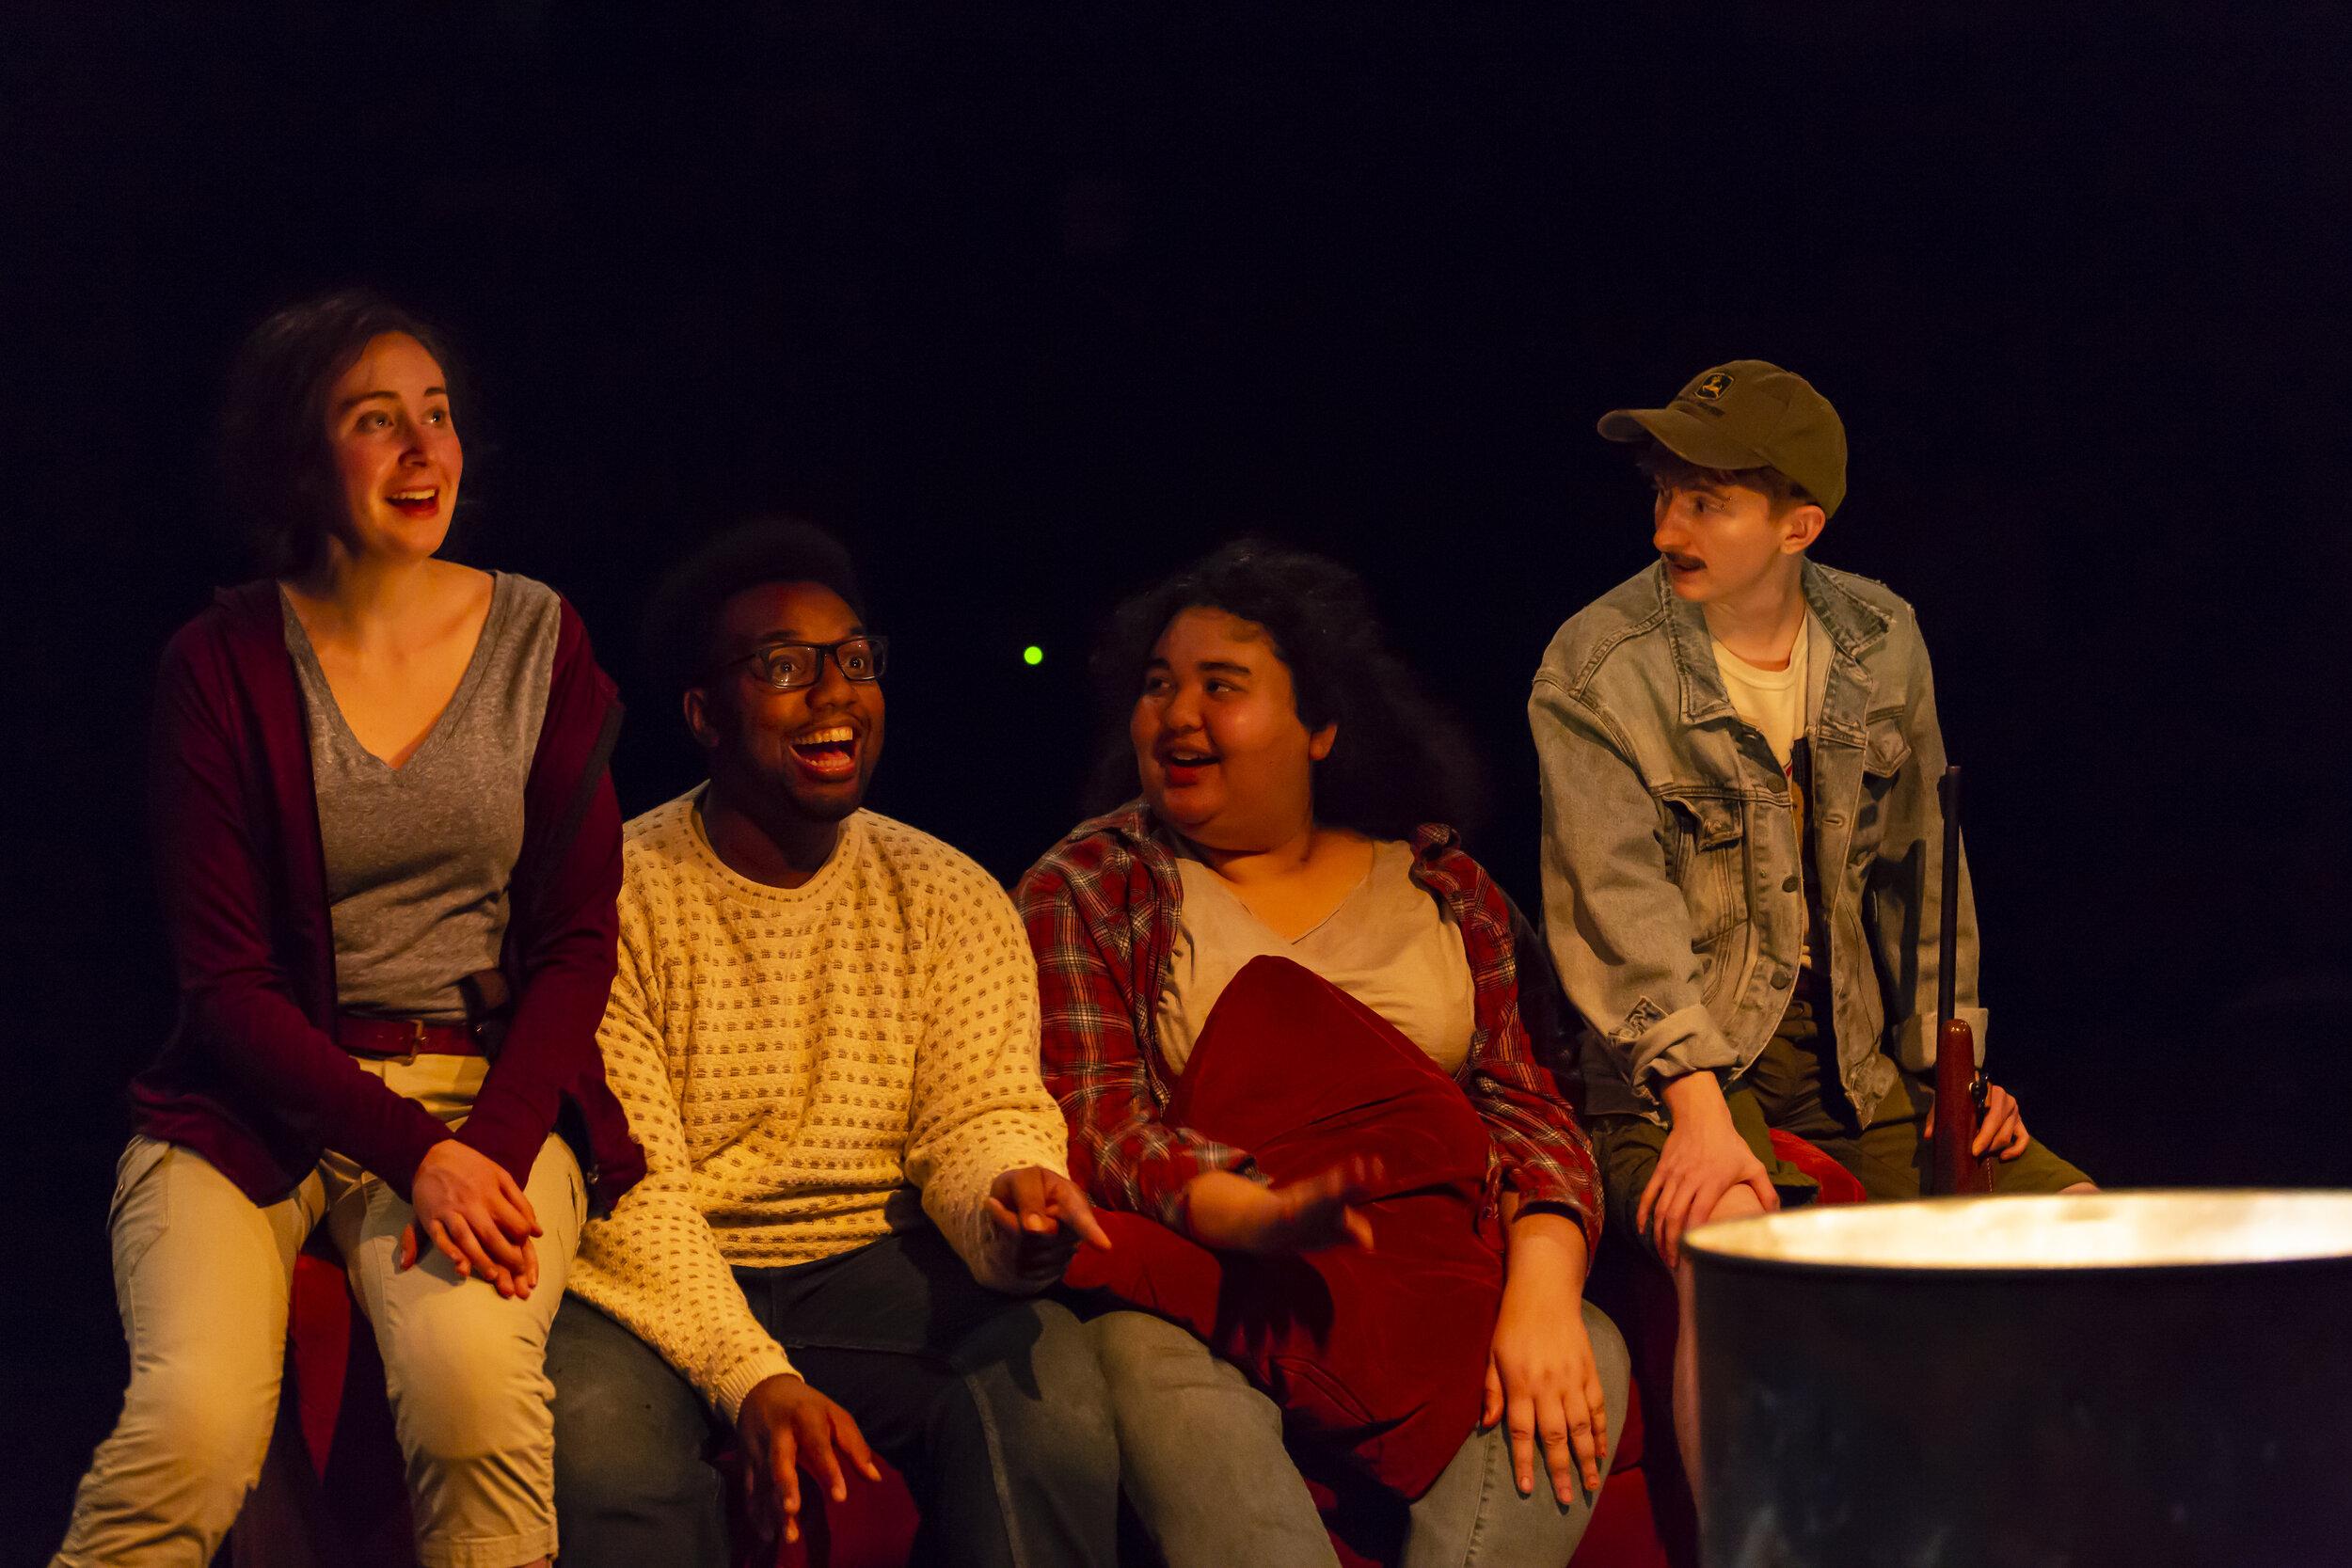 Jenny (Madeline Seidman), Matt IAnthony Holiday), Maria (Ilia Isorelýs Paulino), Sam (Reed Northrup) in Yale School of Drama's production of Mr Burns by Anne Washburn, directed by Kat Yen (photo by T. Charles Erickson)